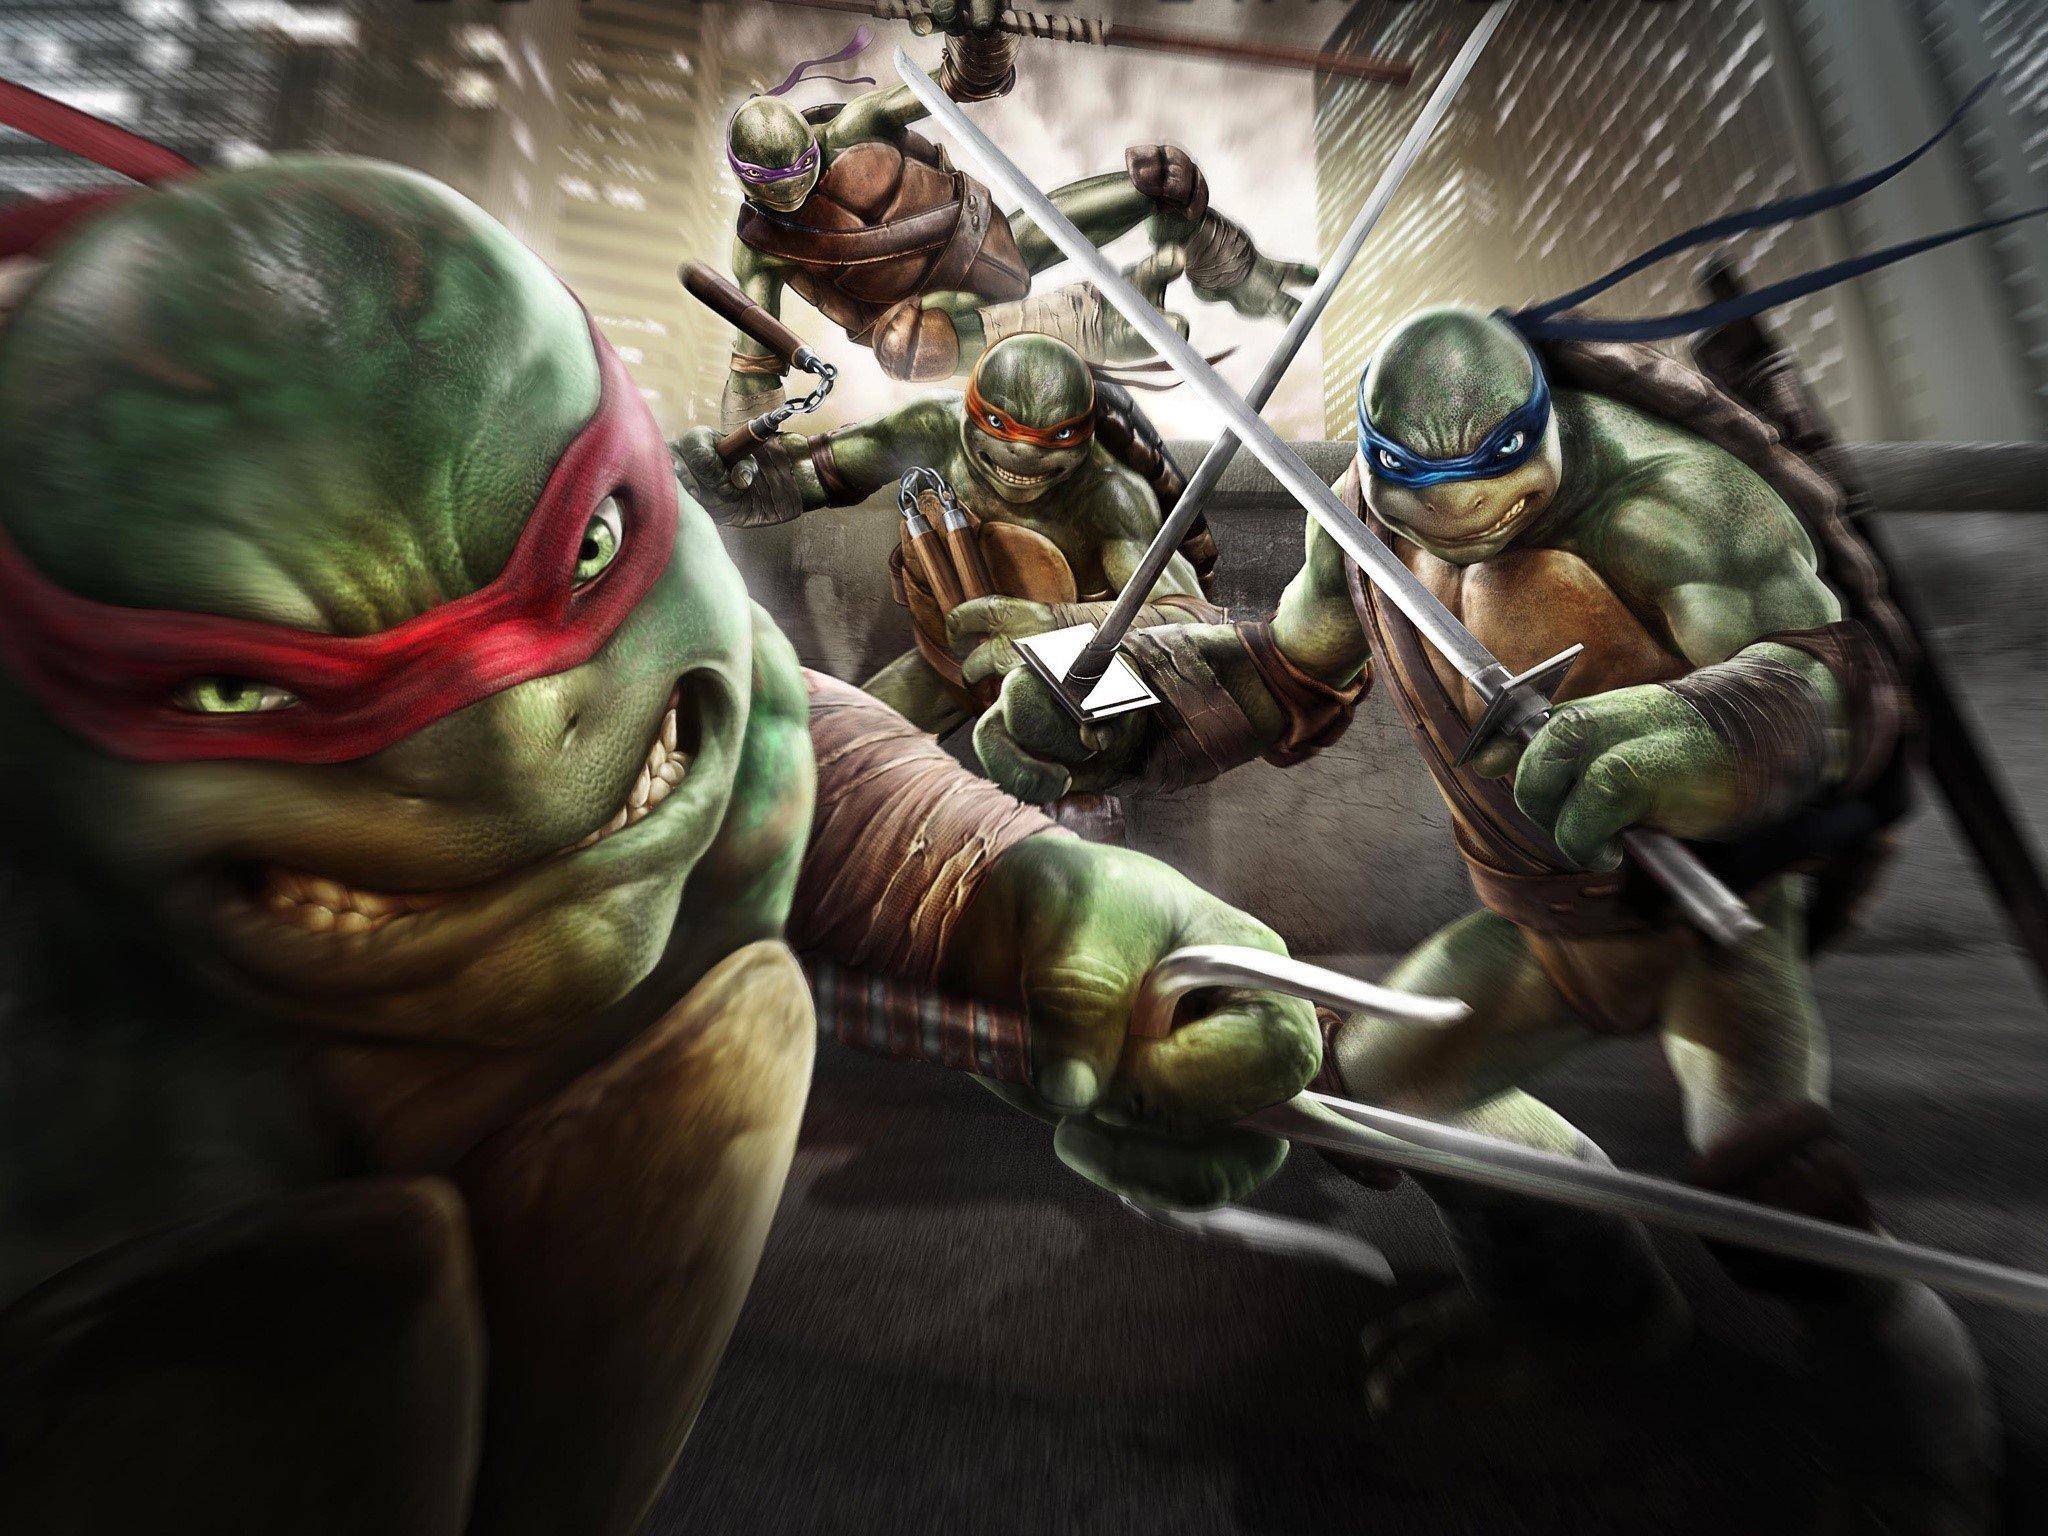 Fondos de pantalla Tortugas Ninja